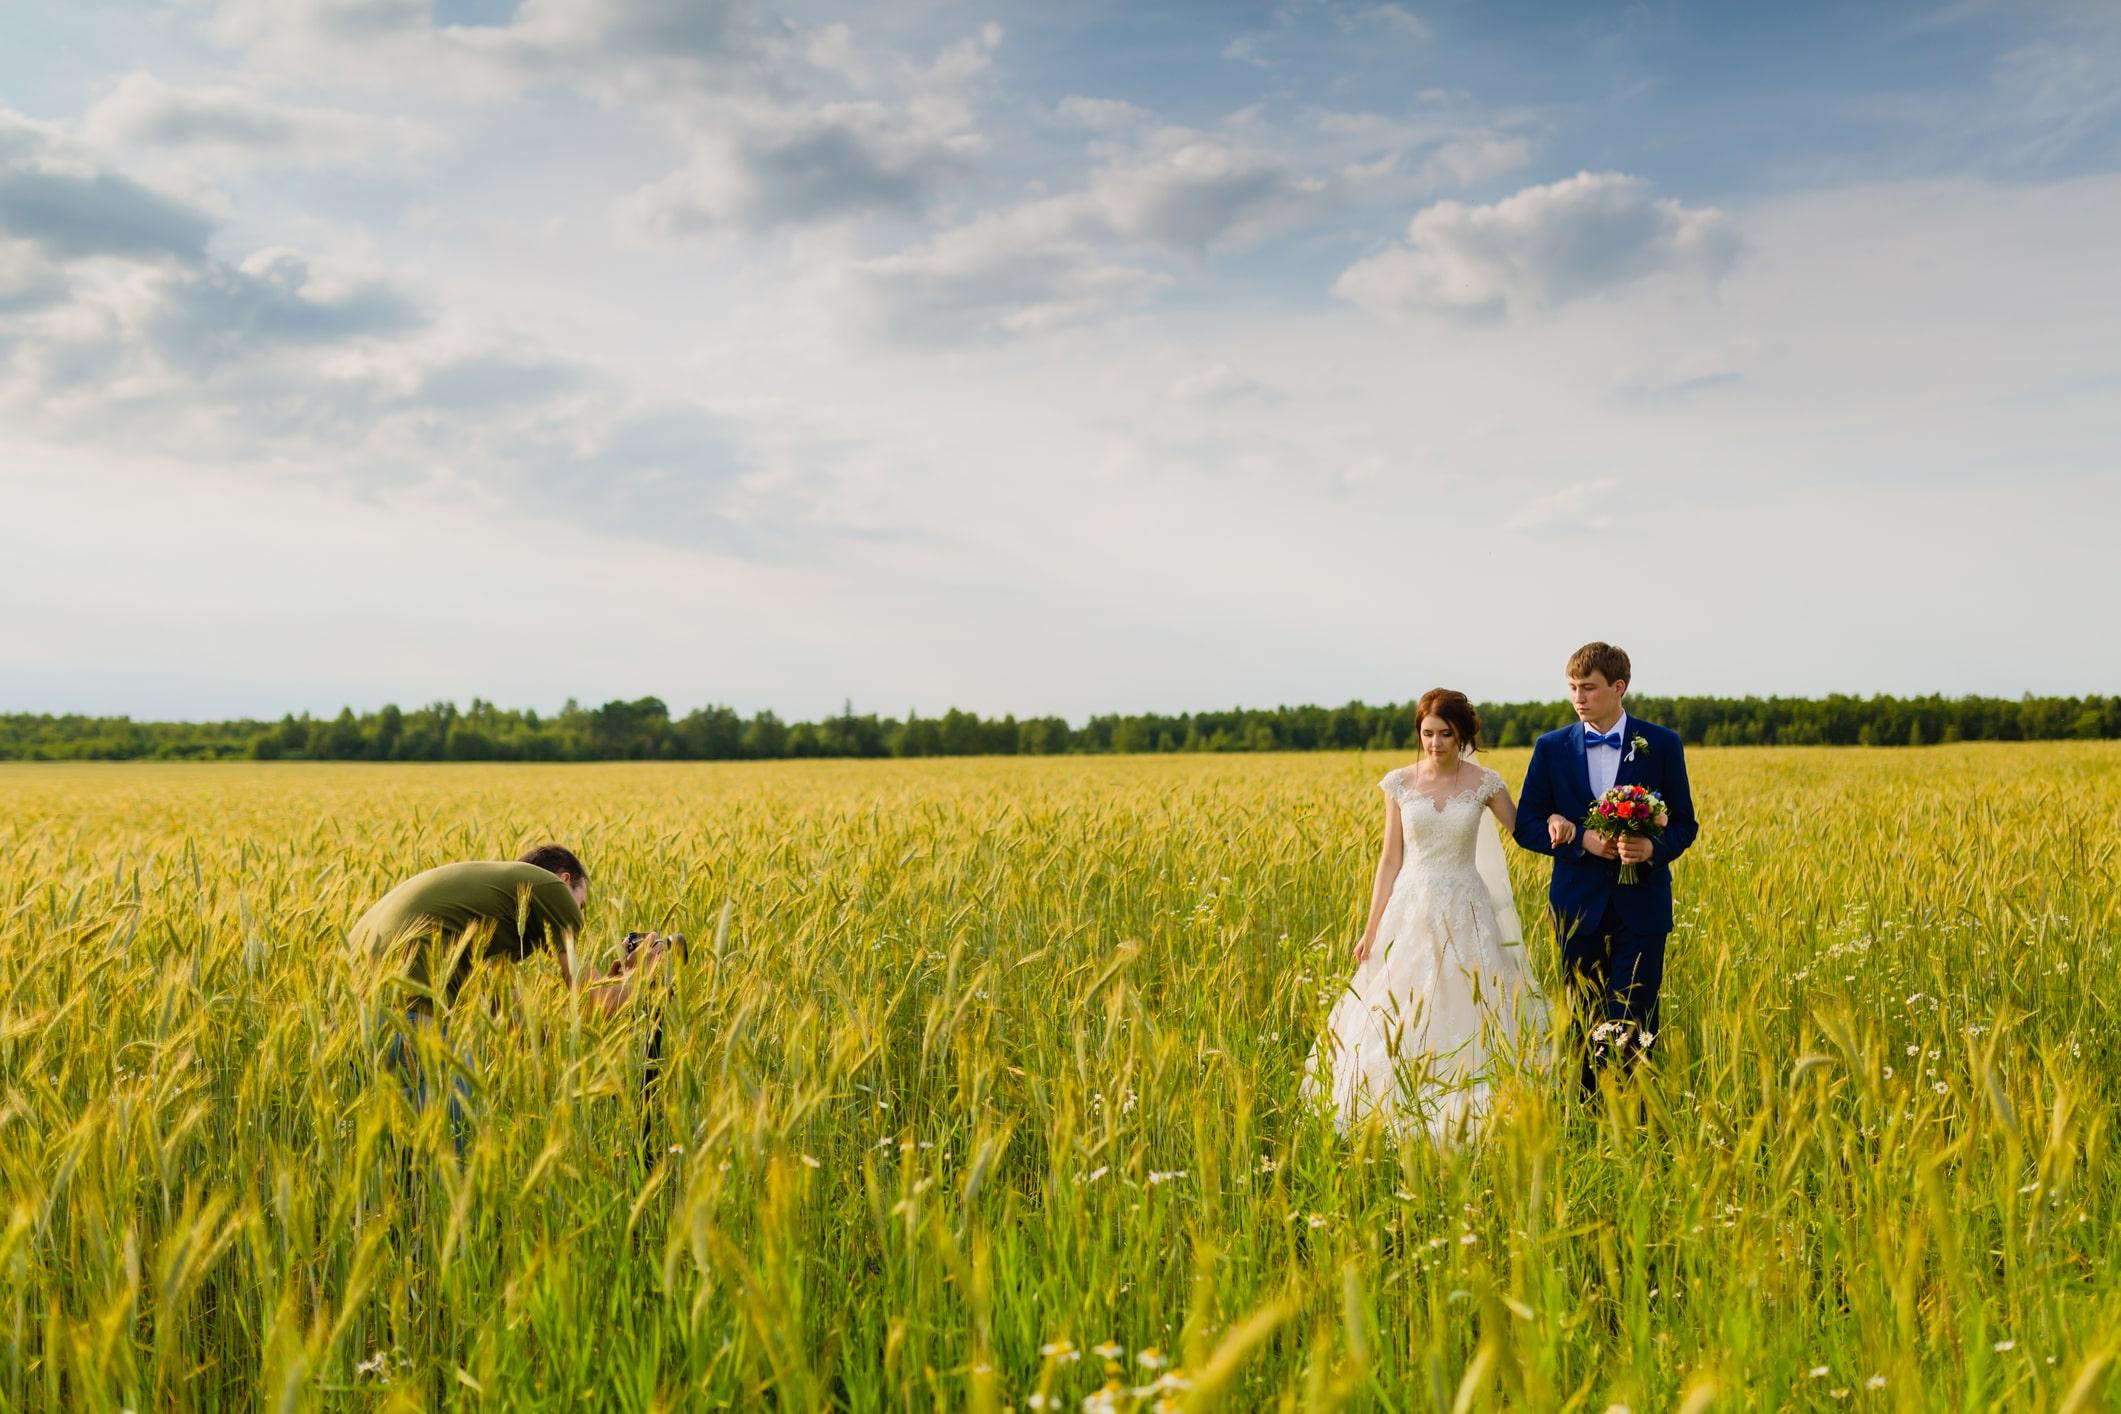 wedding videography tips image